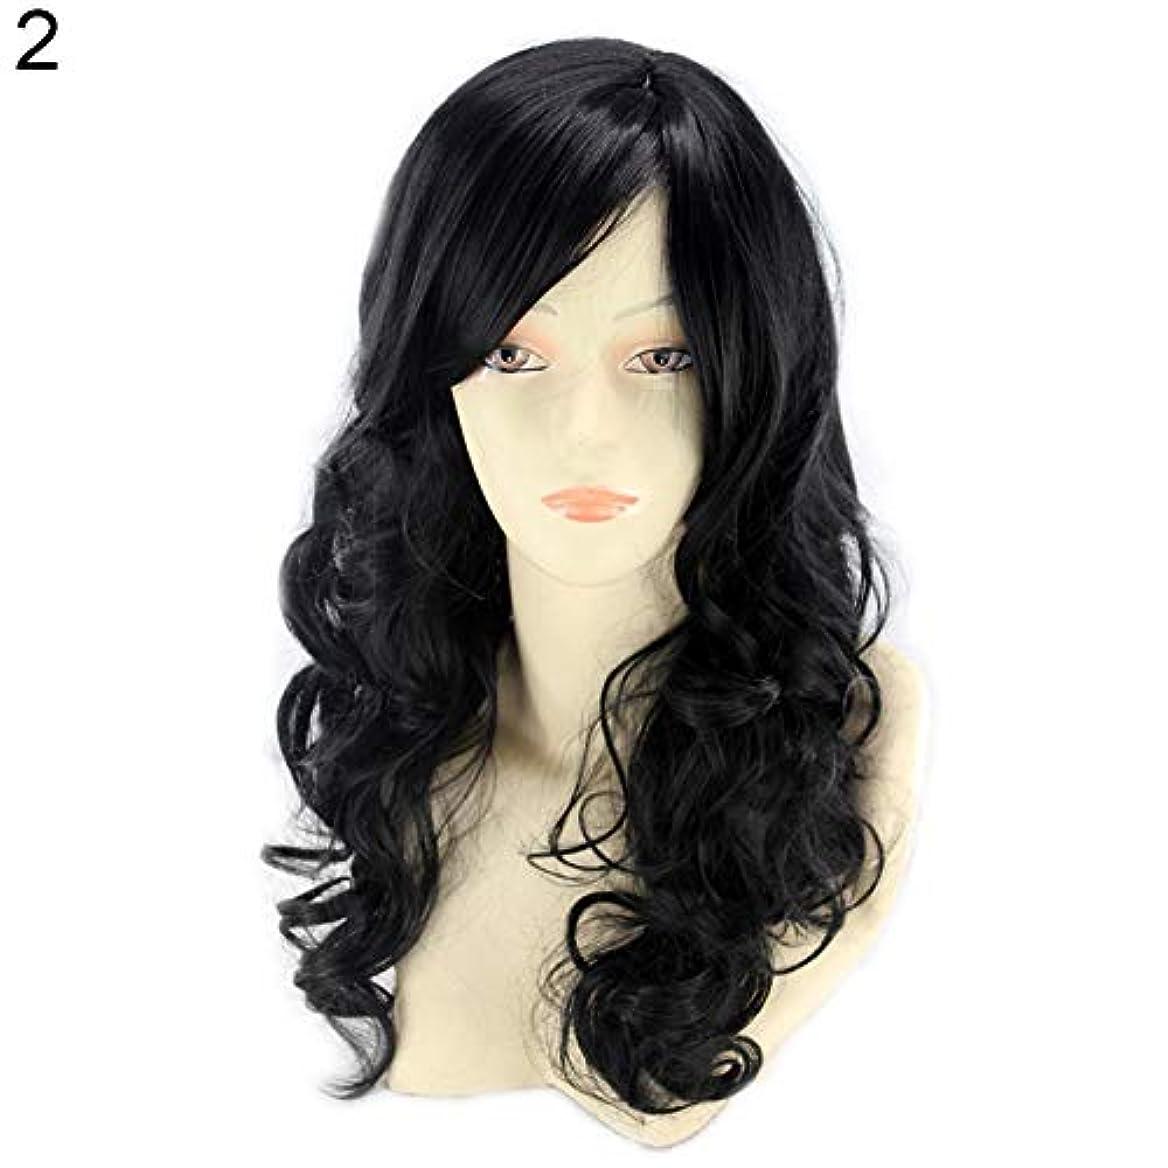 slQinjiansav女性ウィッグ修理ツール耐熱性長波状カーリーウィッグ傾斜フリンジマット合成繊維髪